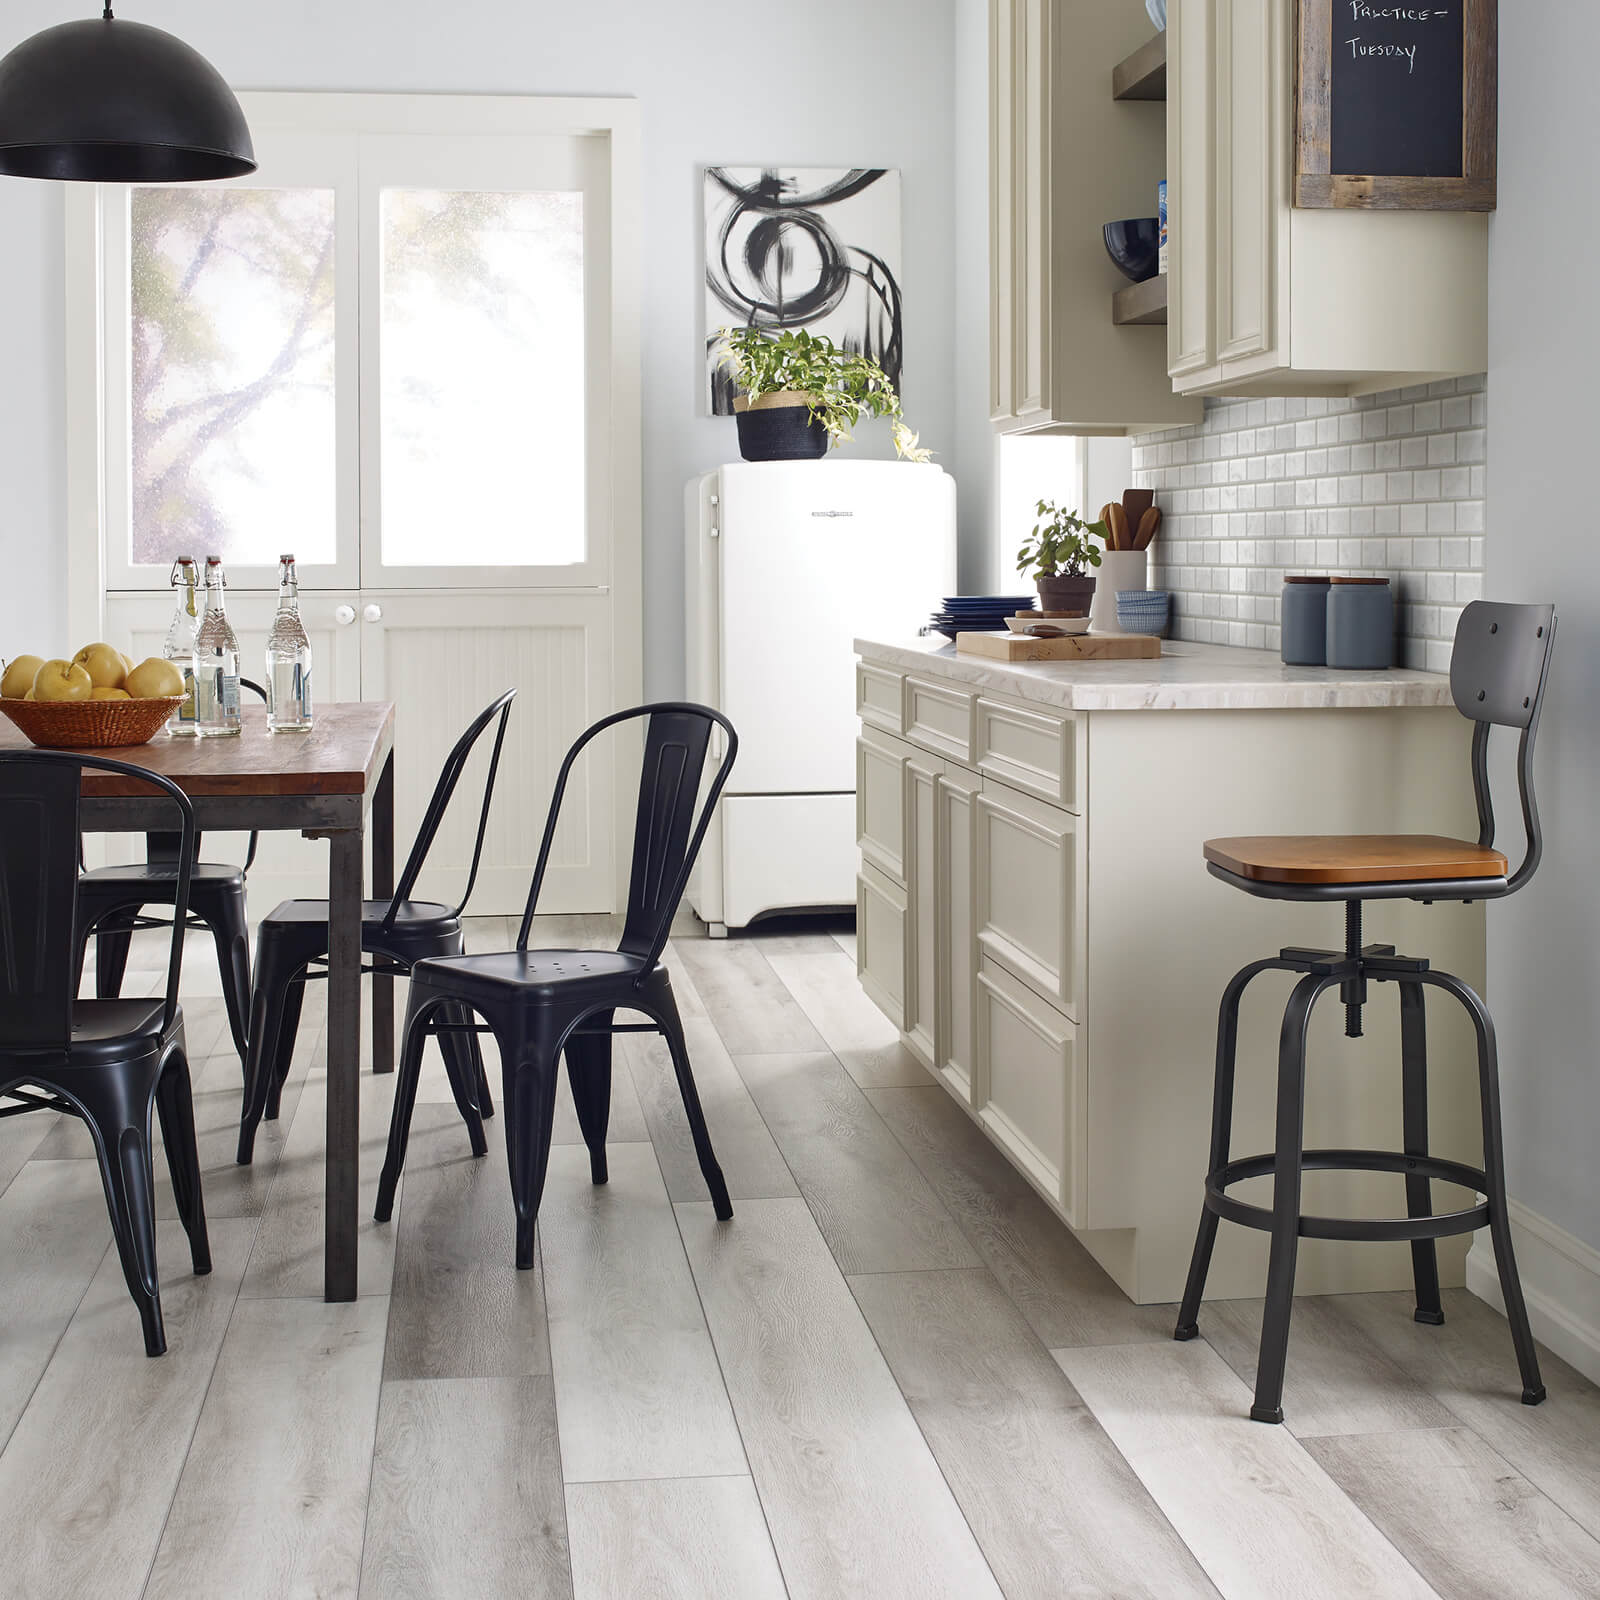 vinyl flooring in kitchen | Dolphin Carpet & Tile